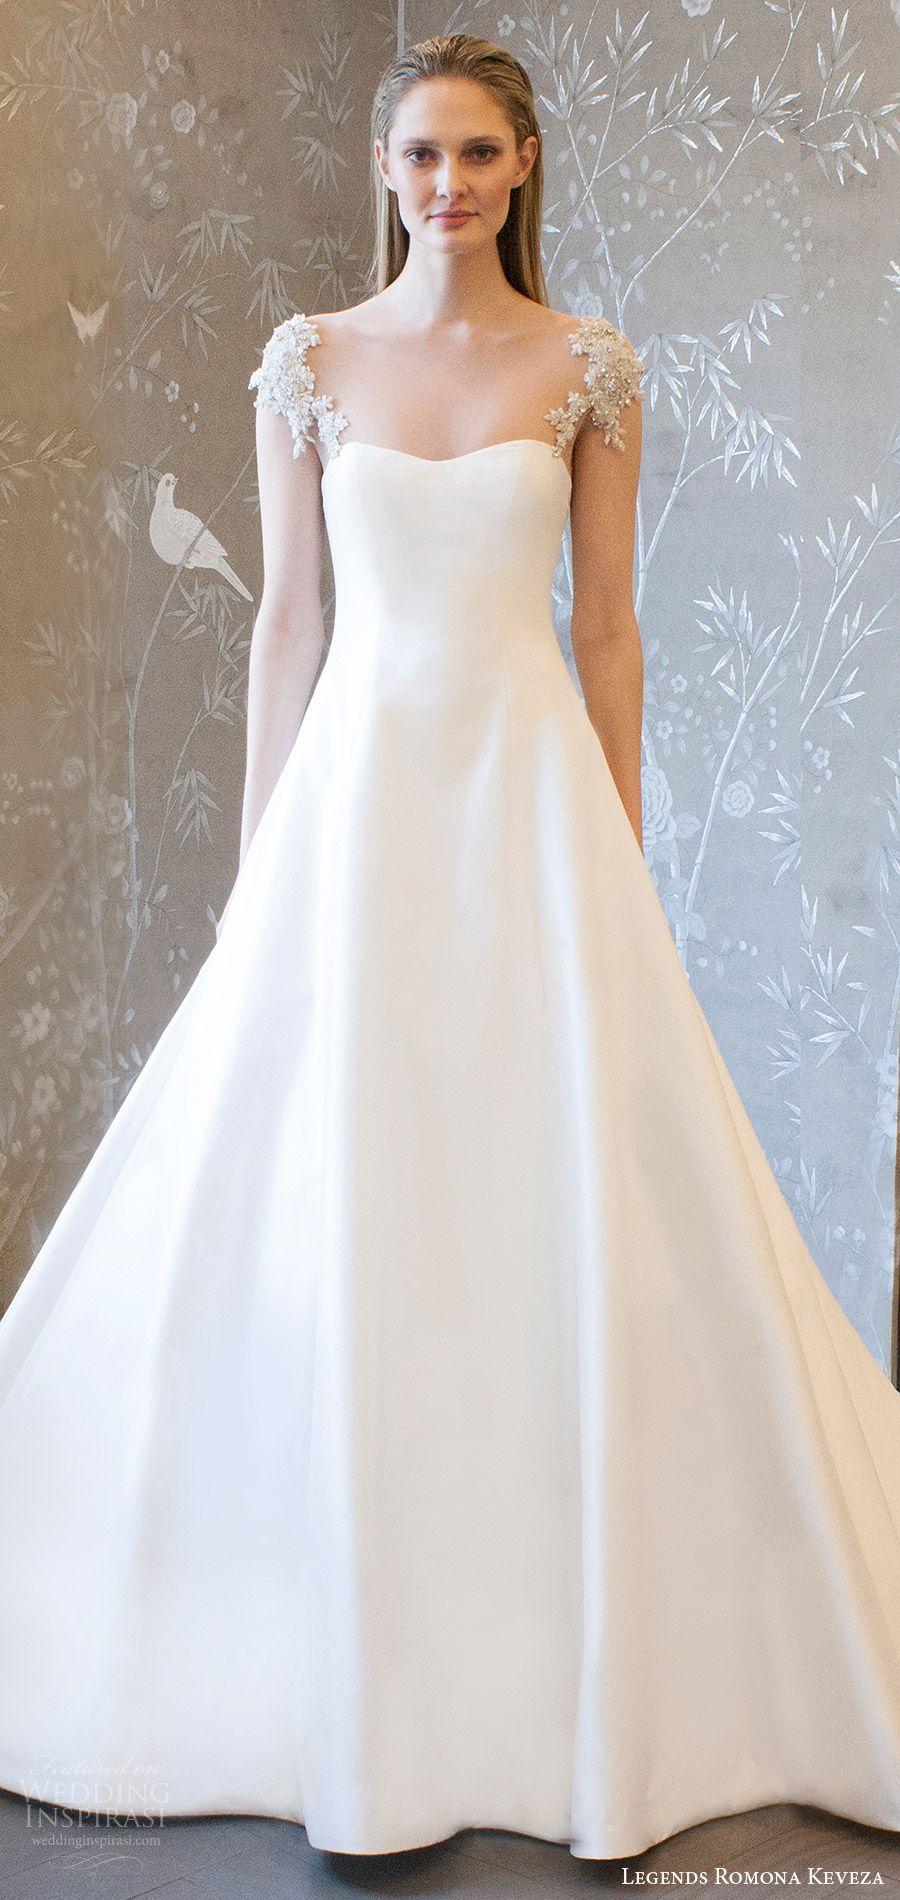 Legends Romona Keveza Spring 2018 Wedding Dresses | Wedding ...